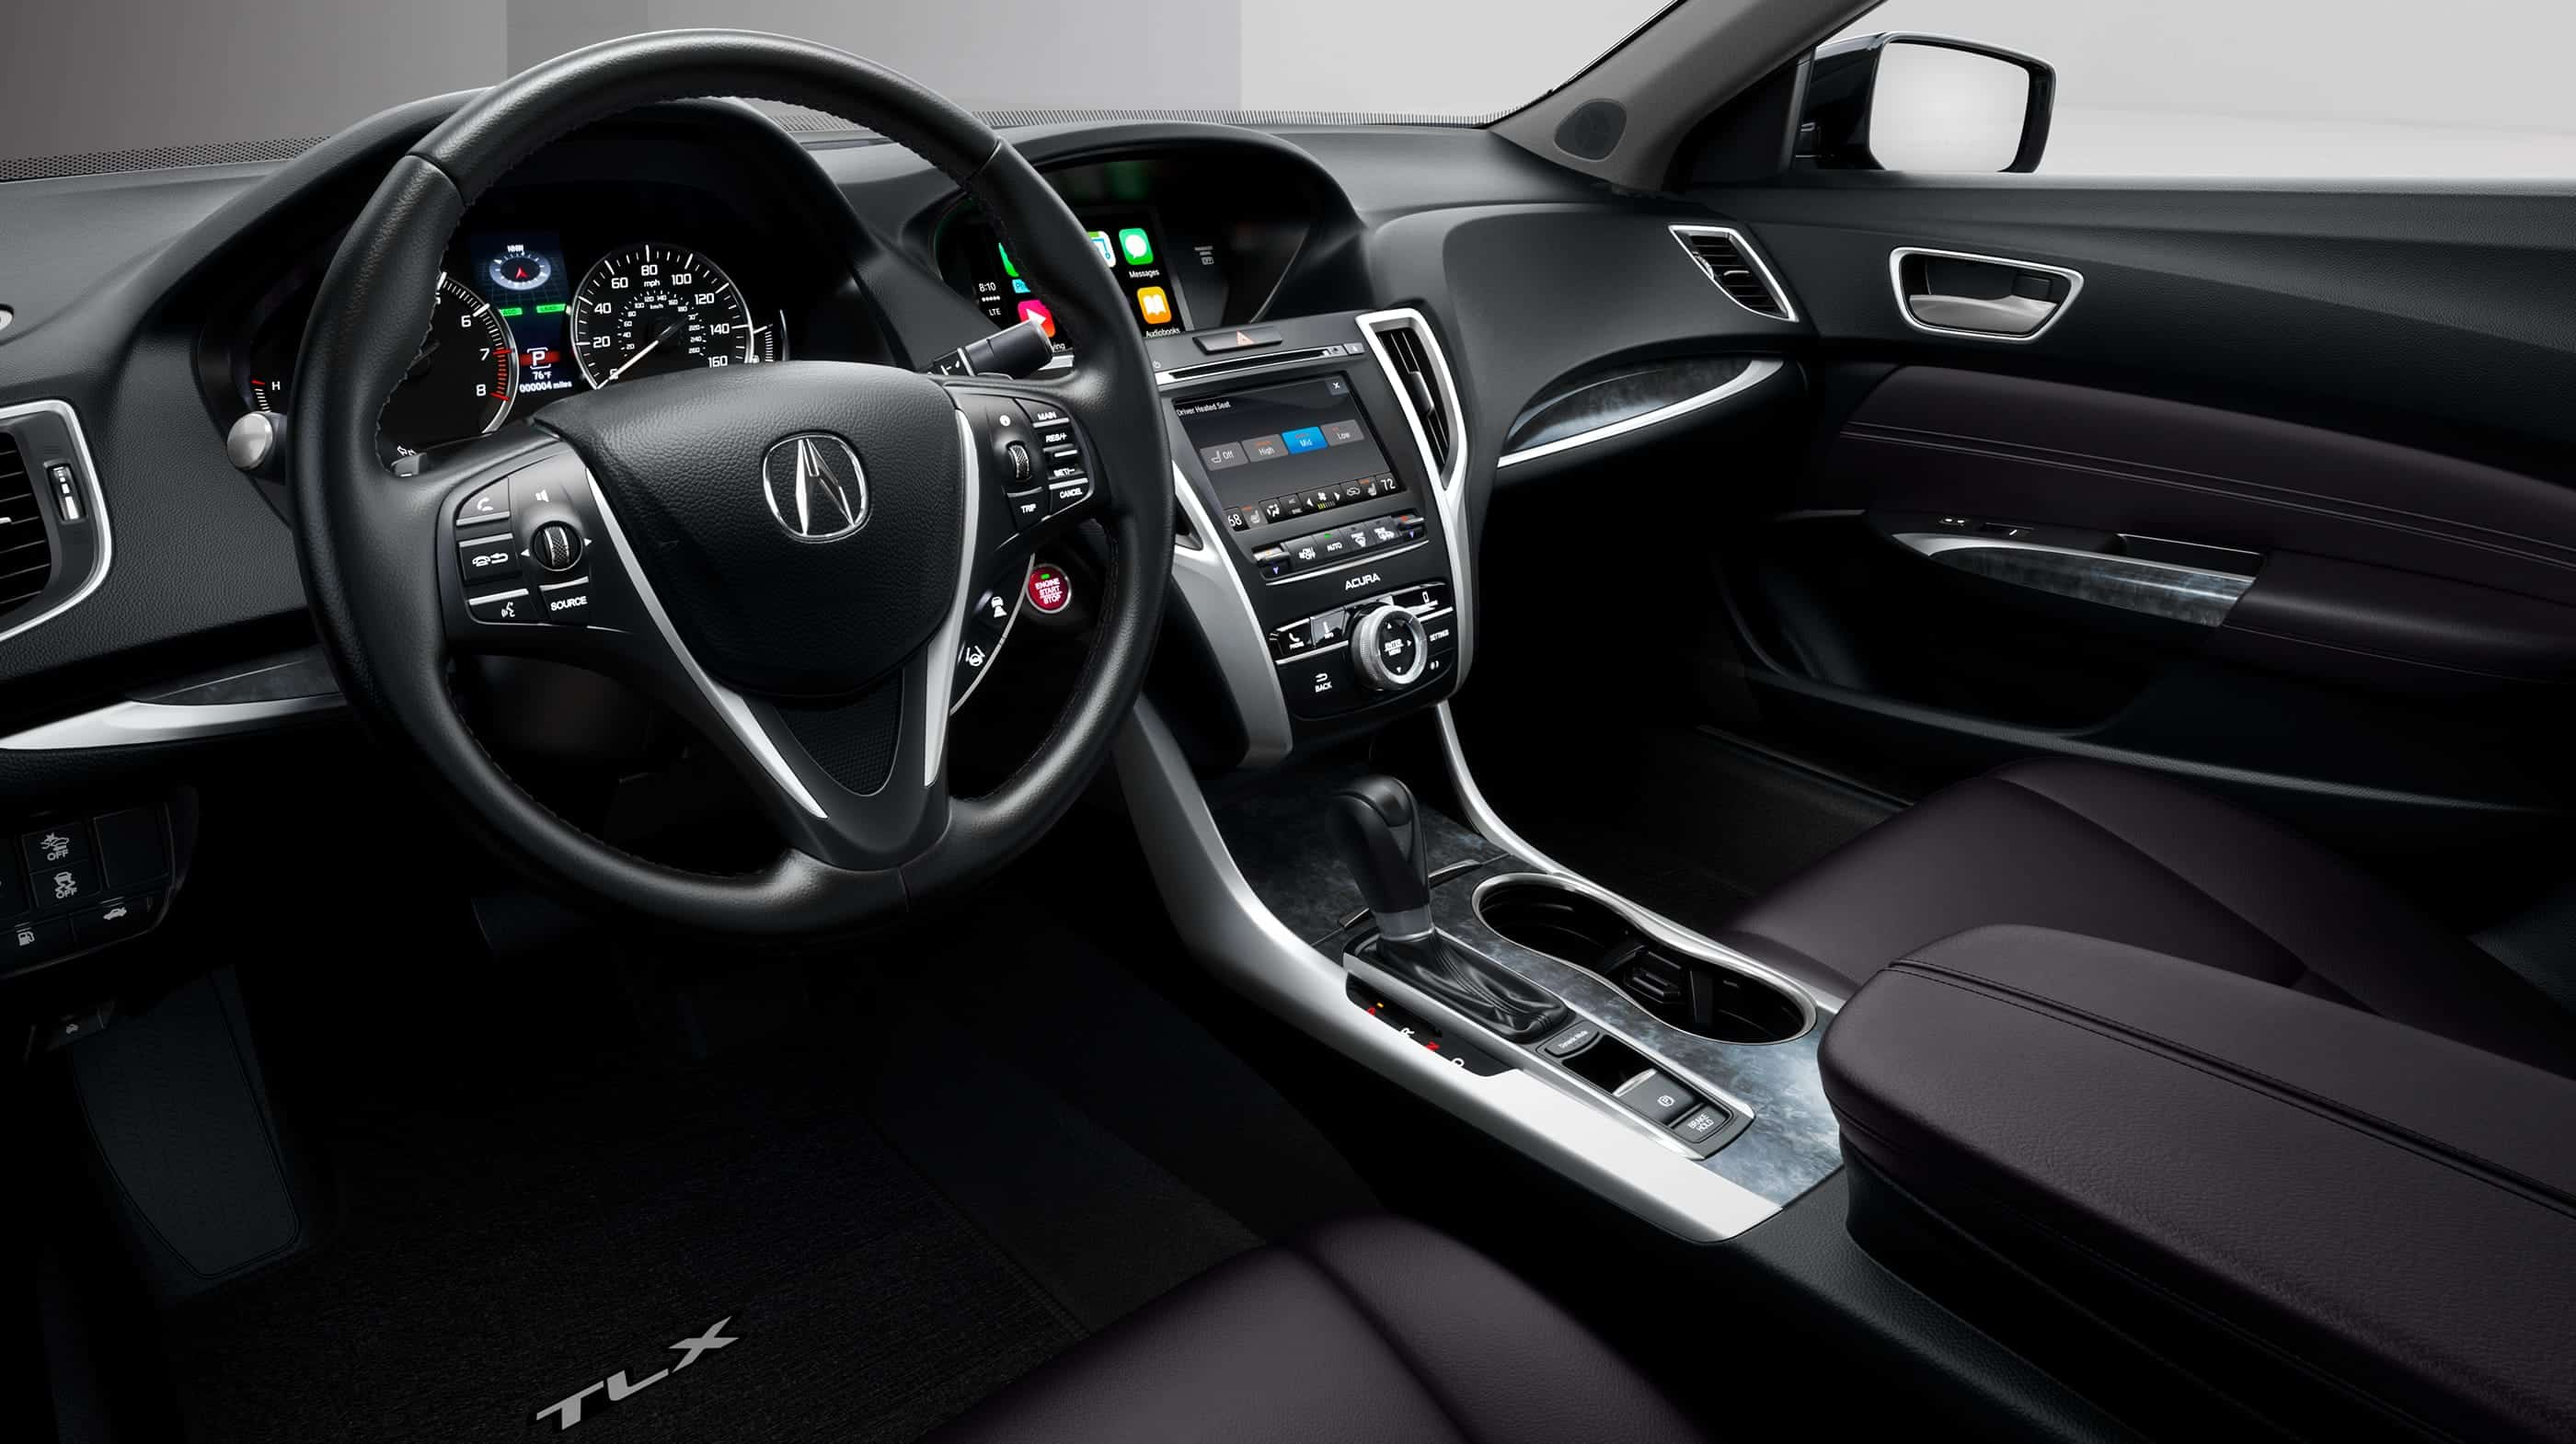 Interior of the 2020 Acura TLX